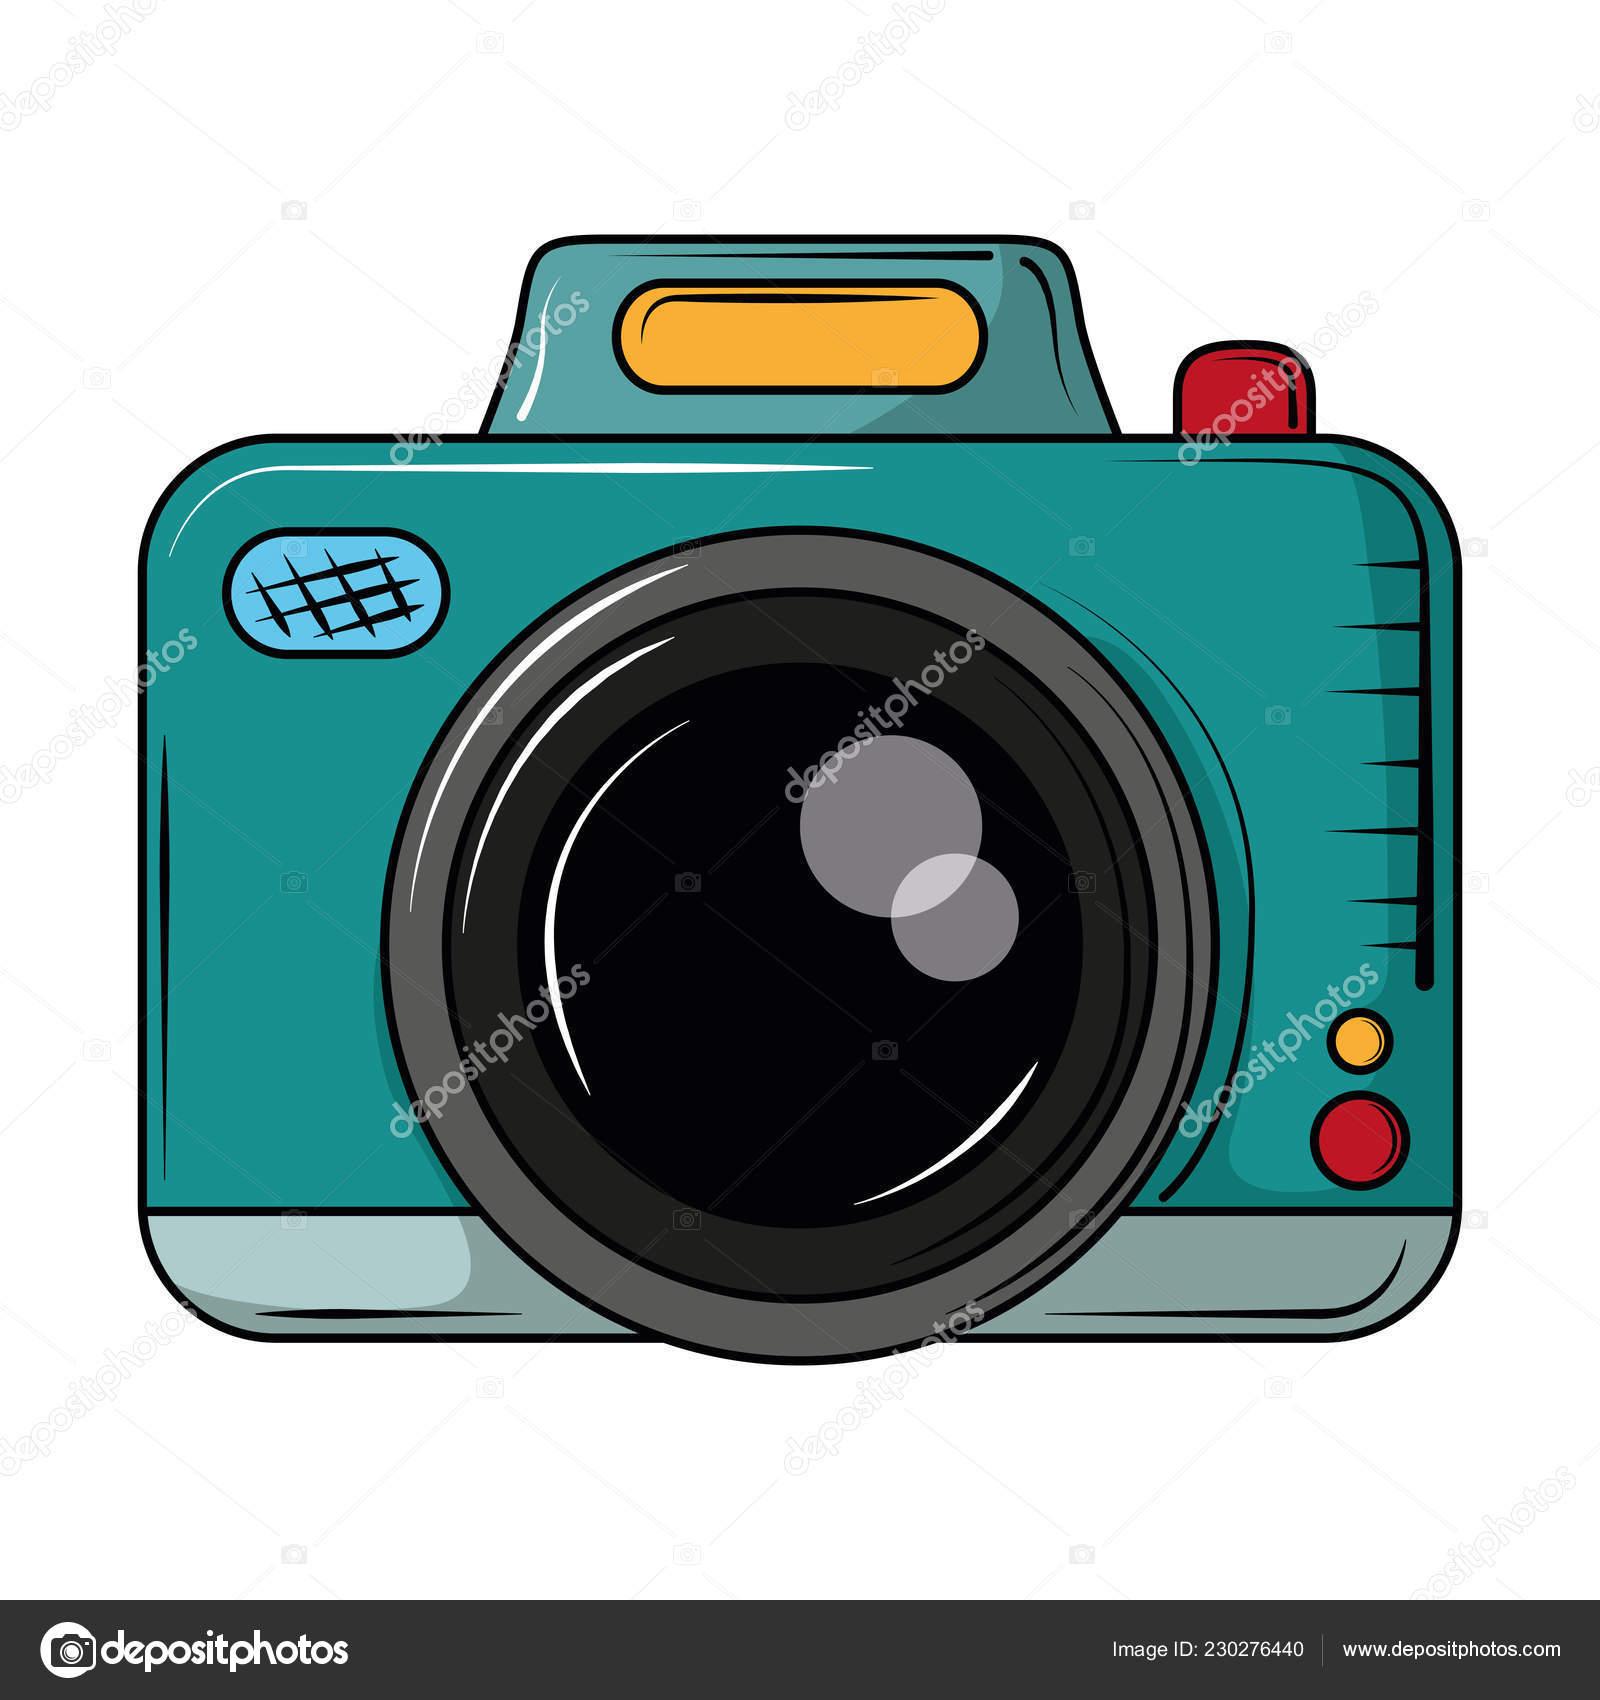 Vintage Photographic Camera Stock Vector C Jemastock 230276440